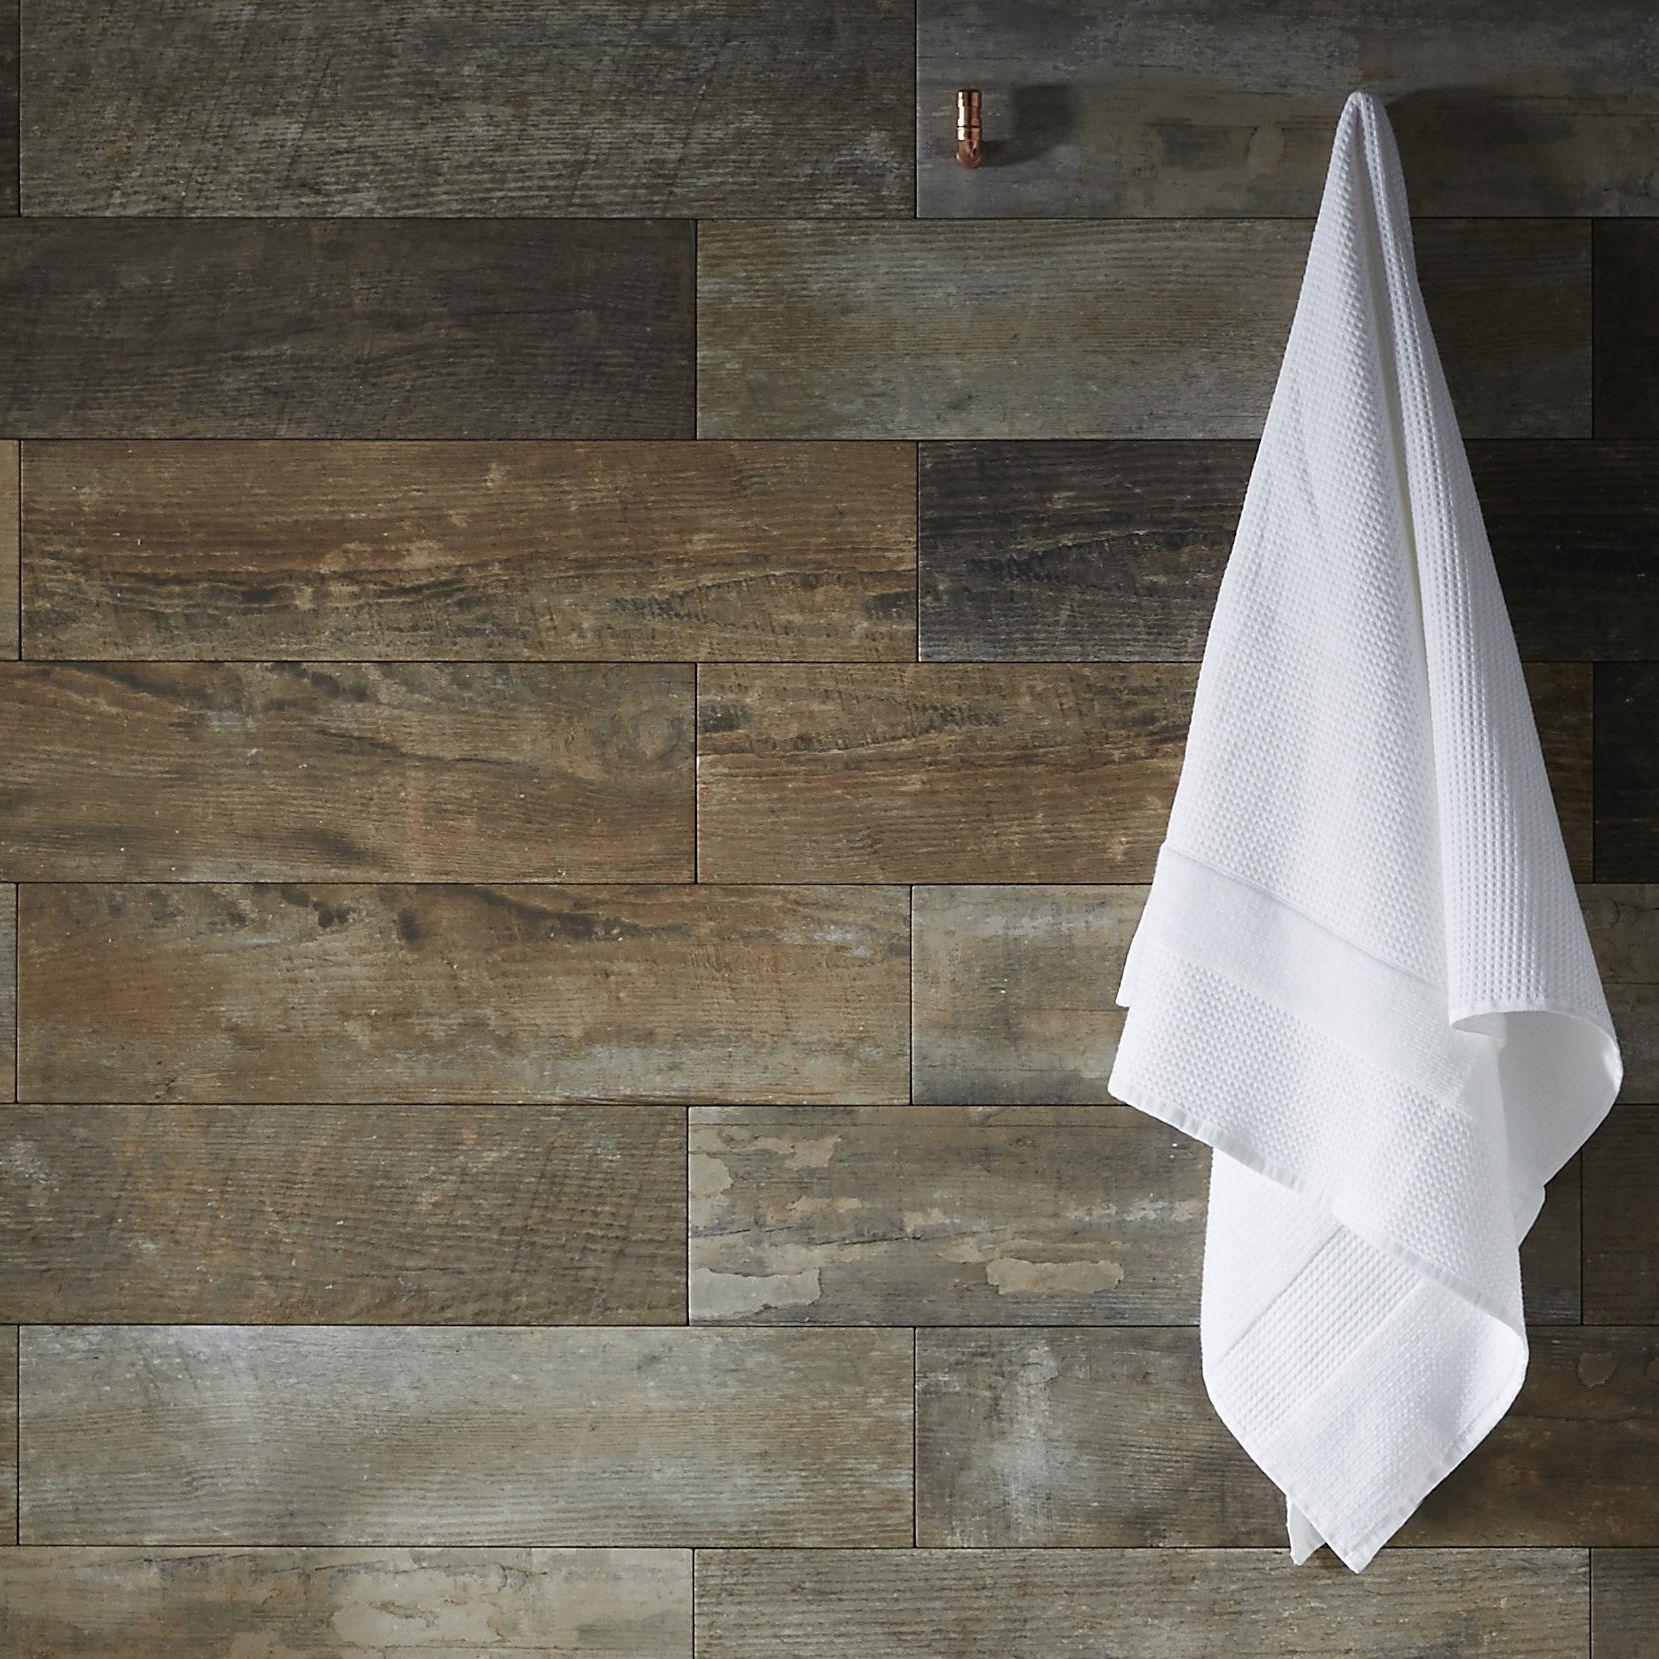 Holborn White Ceramic Wall Tile Pack Of 20 L 250mm W: DIY At B&Q